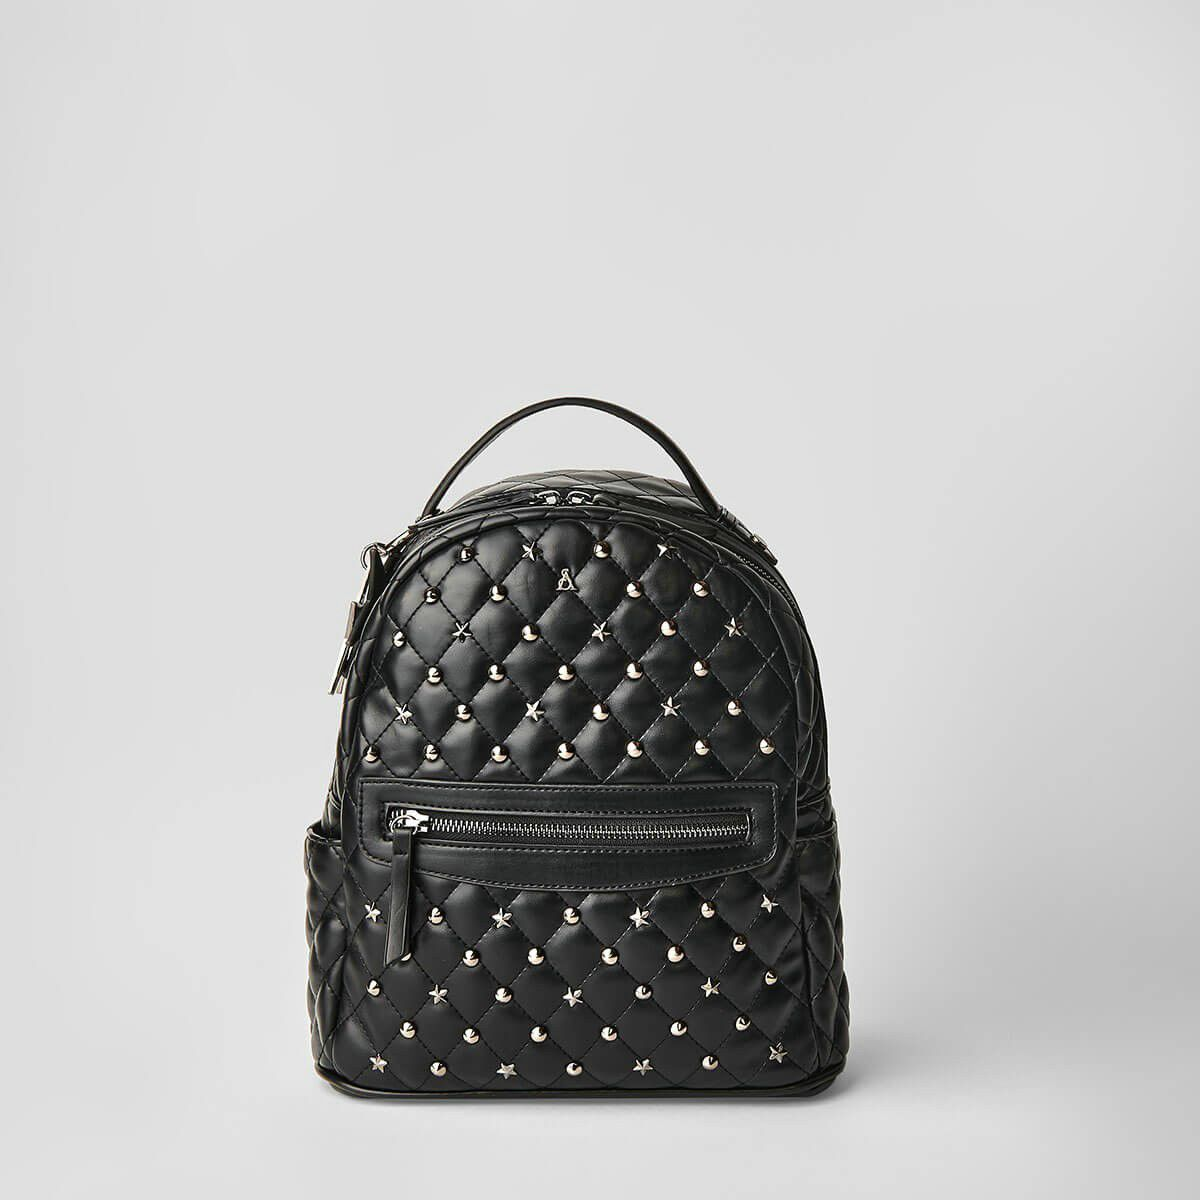 Zaino Pash Bag Atelier Du Sac -10126 REB-WOB Nero